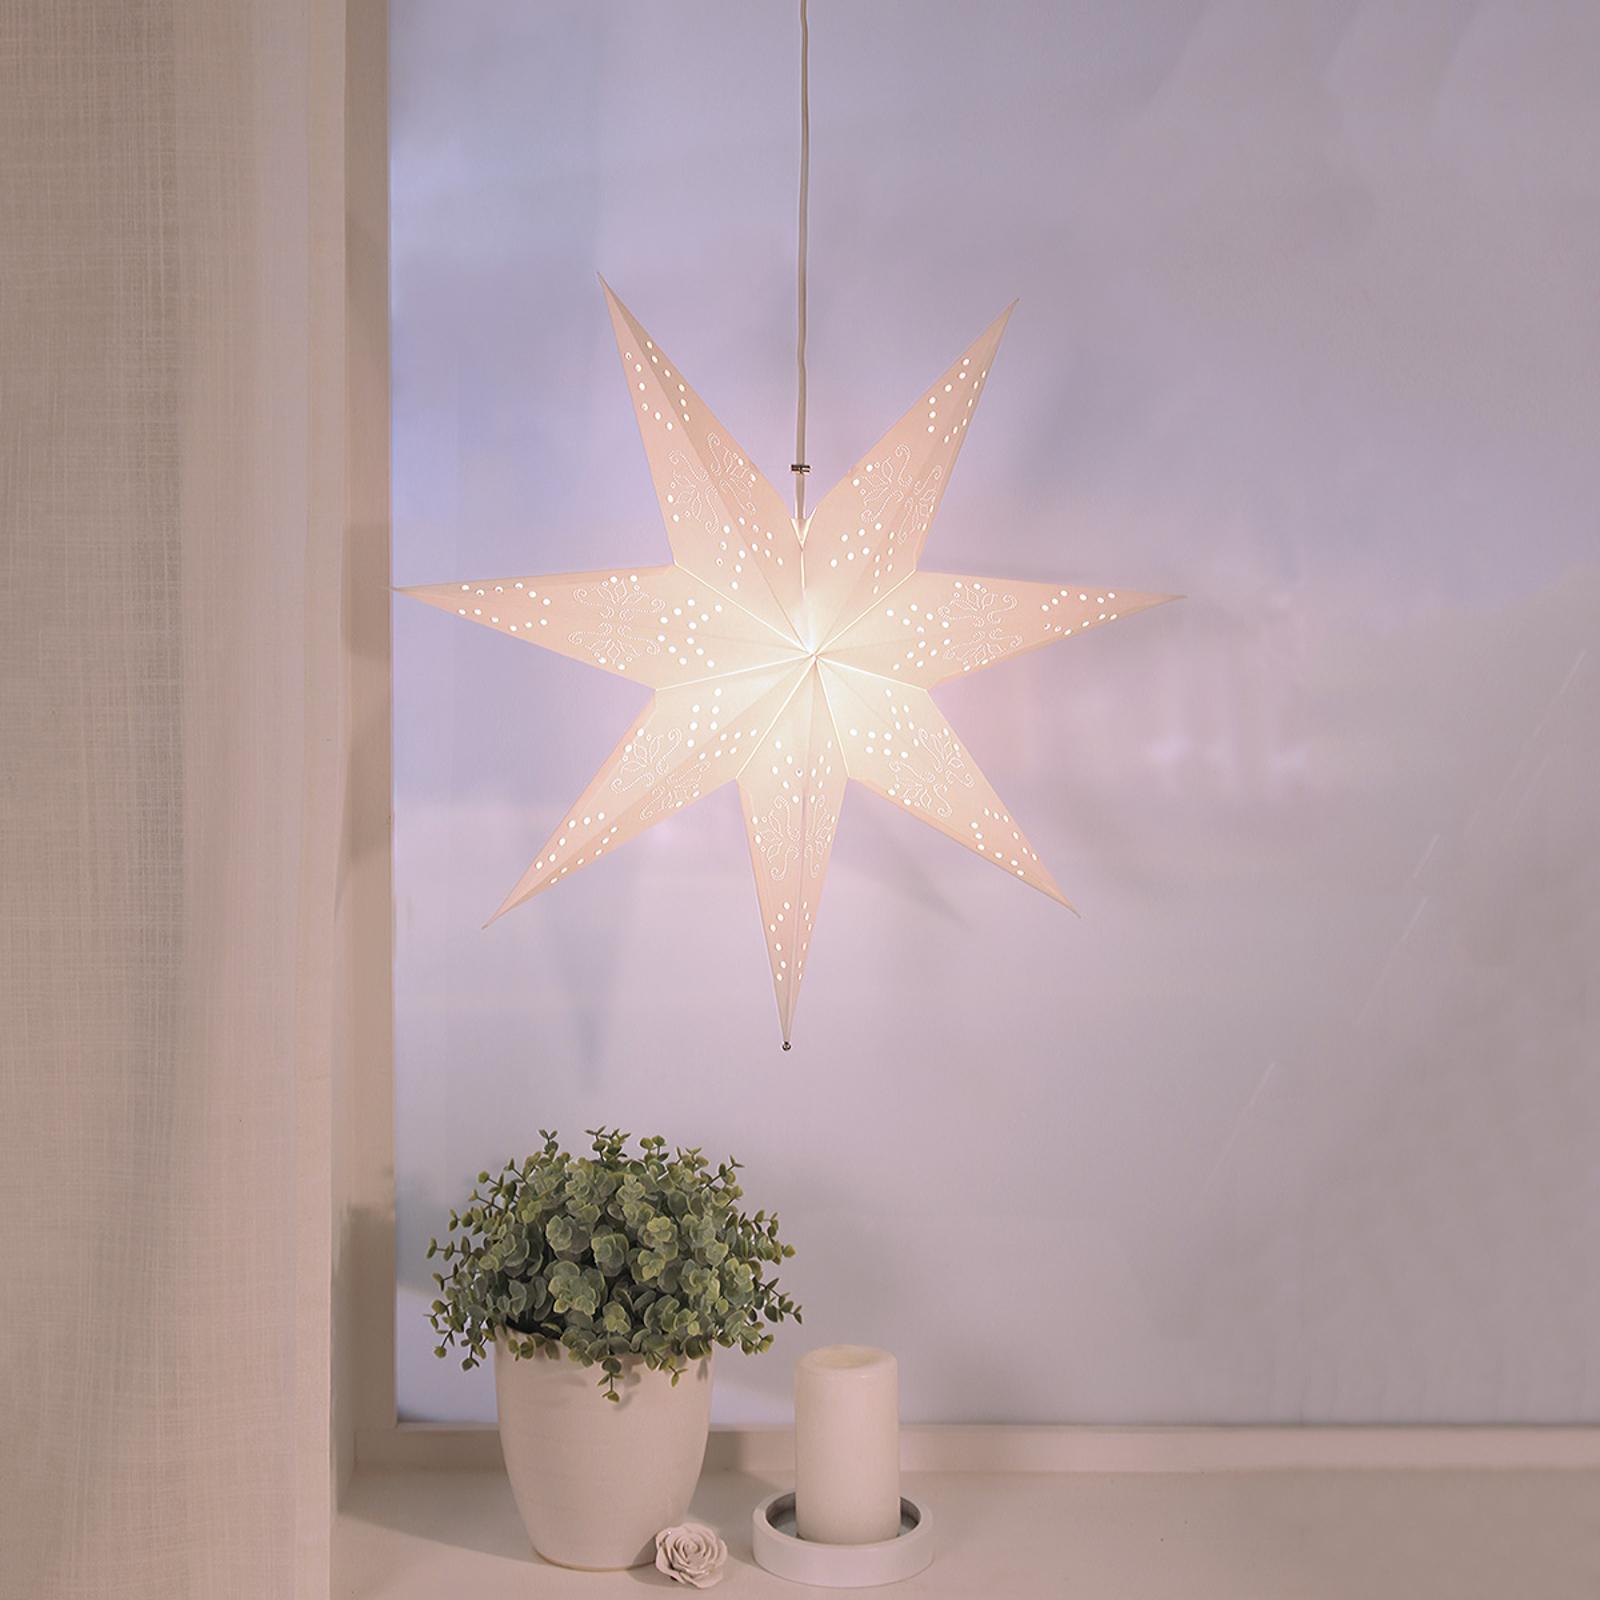 Hanging  paper star Romantic Star_1522763_1